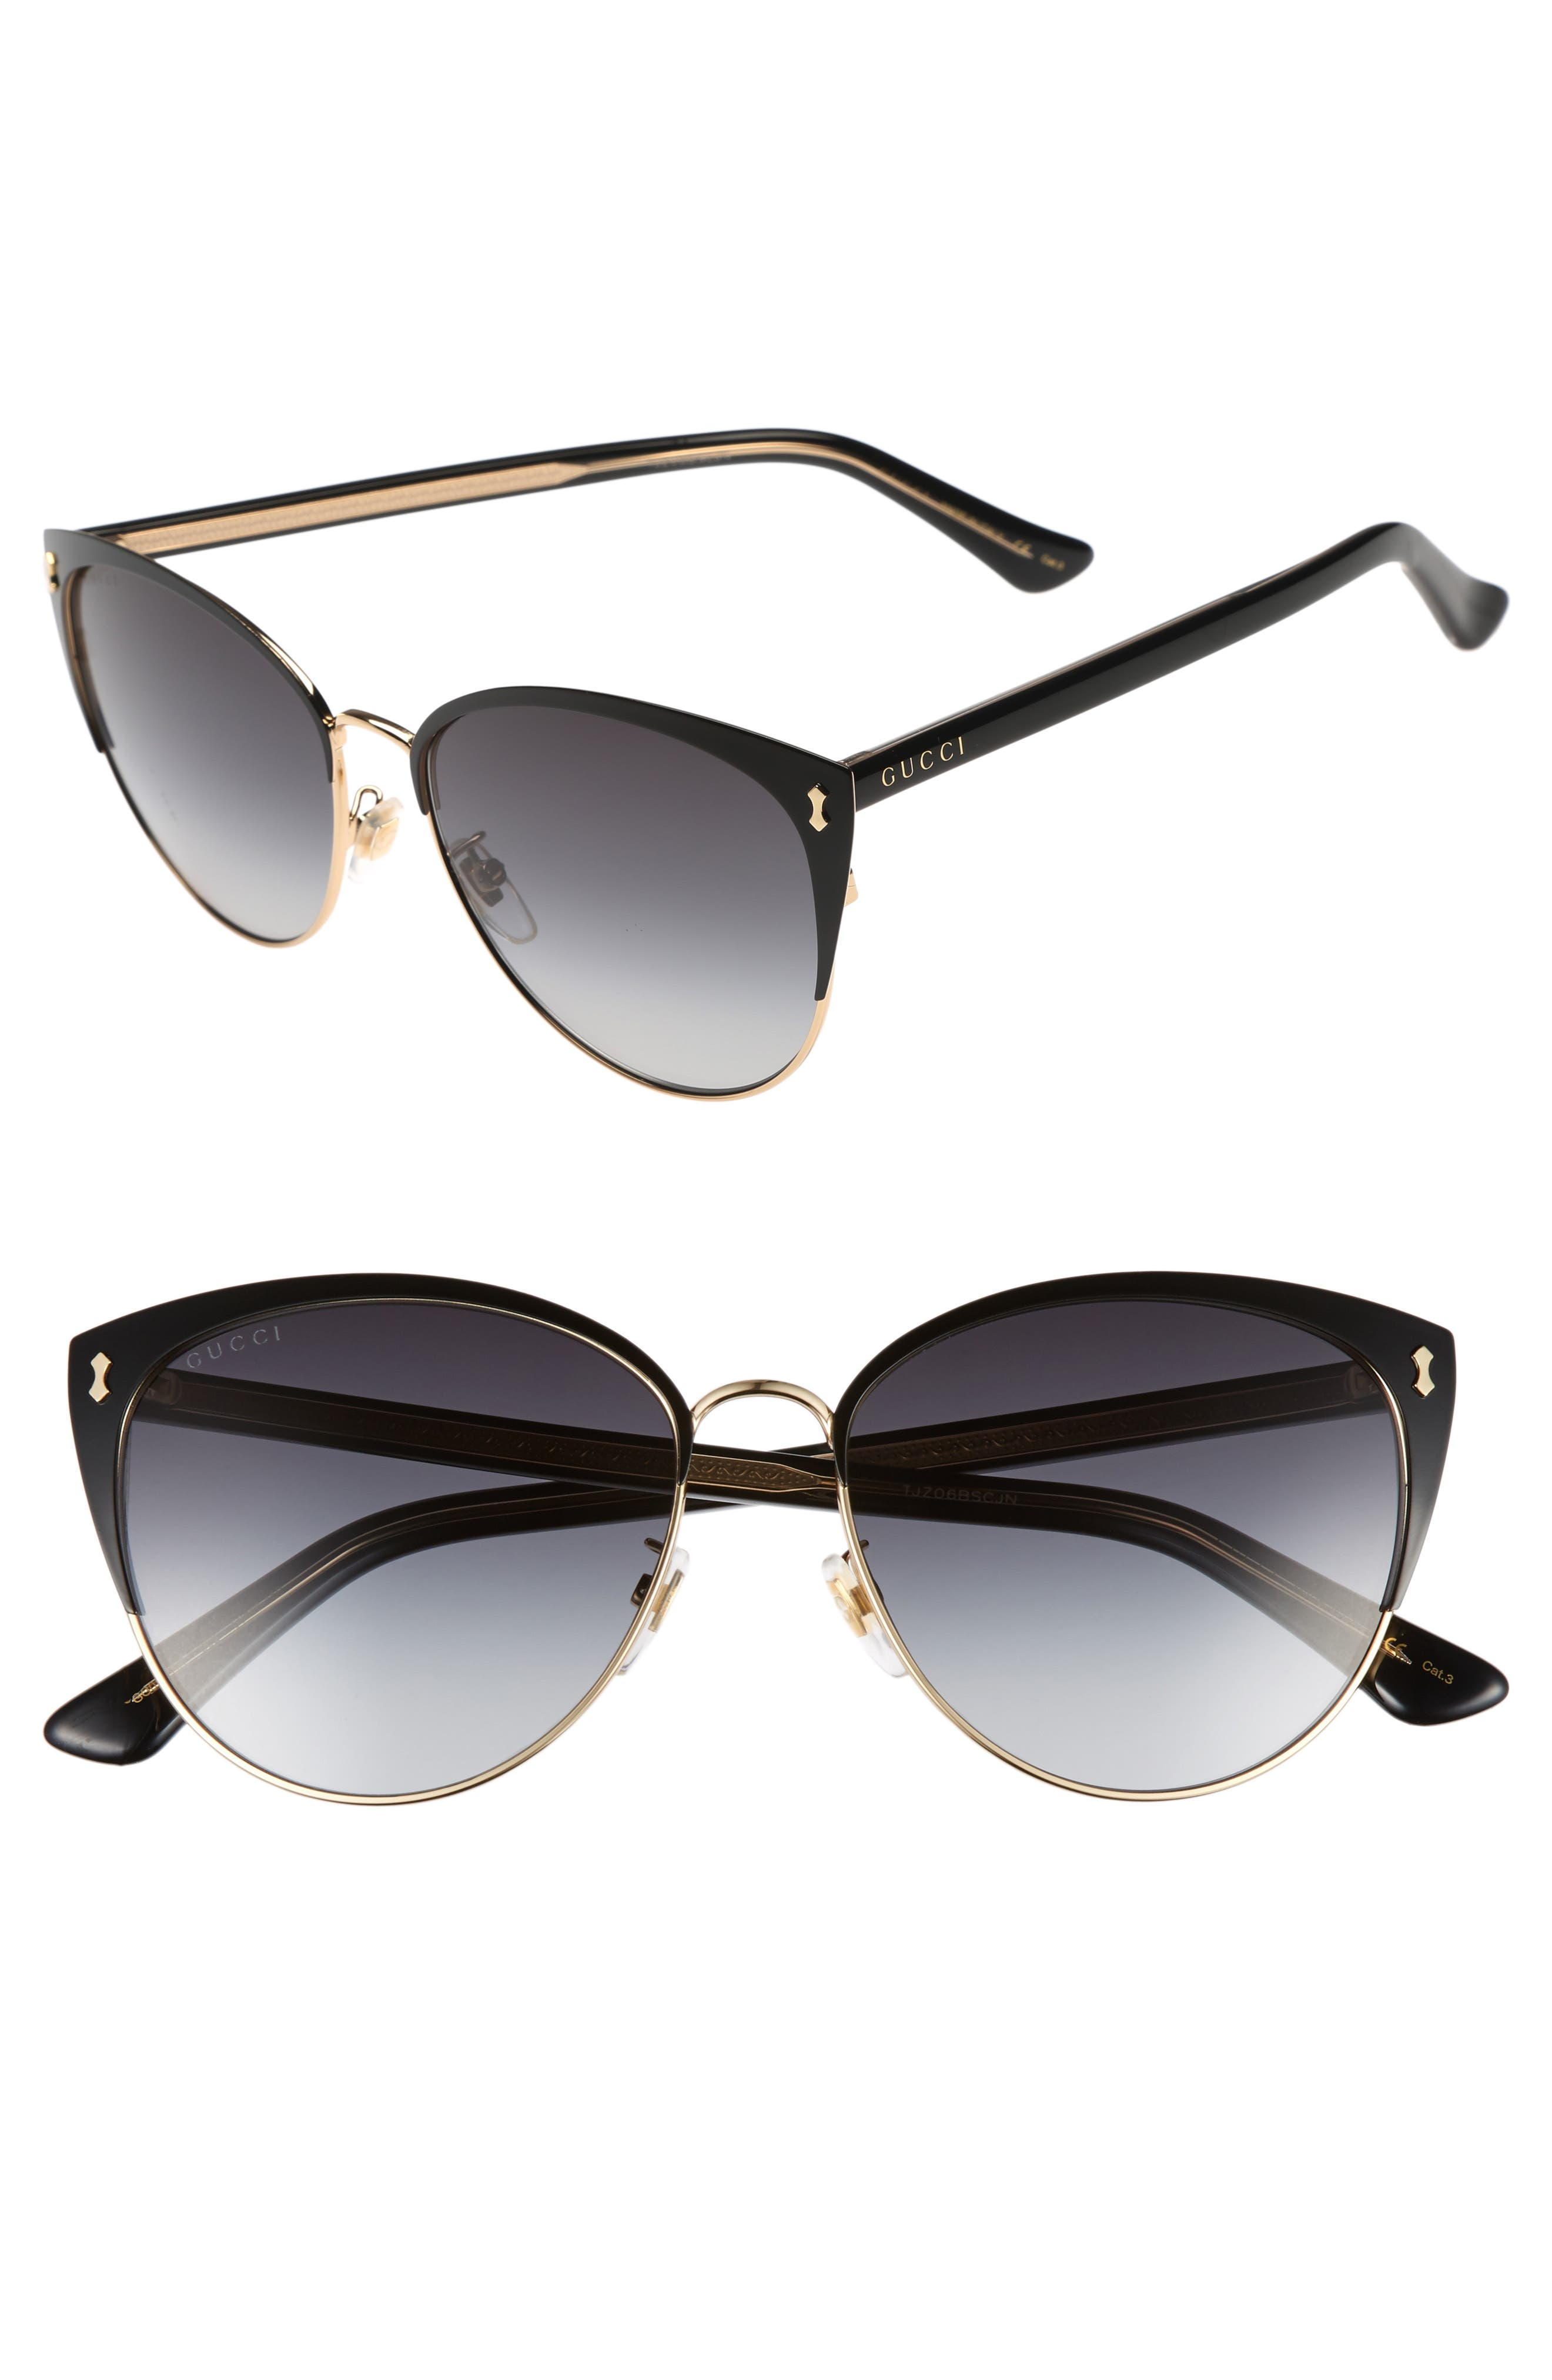 GUCCI, 58mm Cat Eye Sunglasses, Main thumbnail 1, color, BLACK